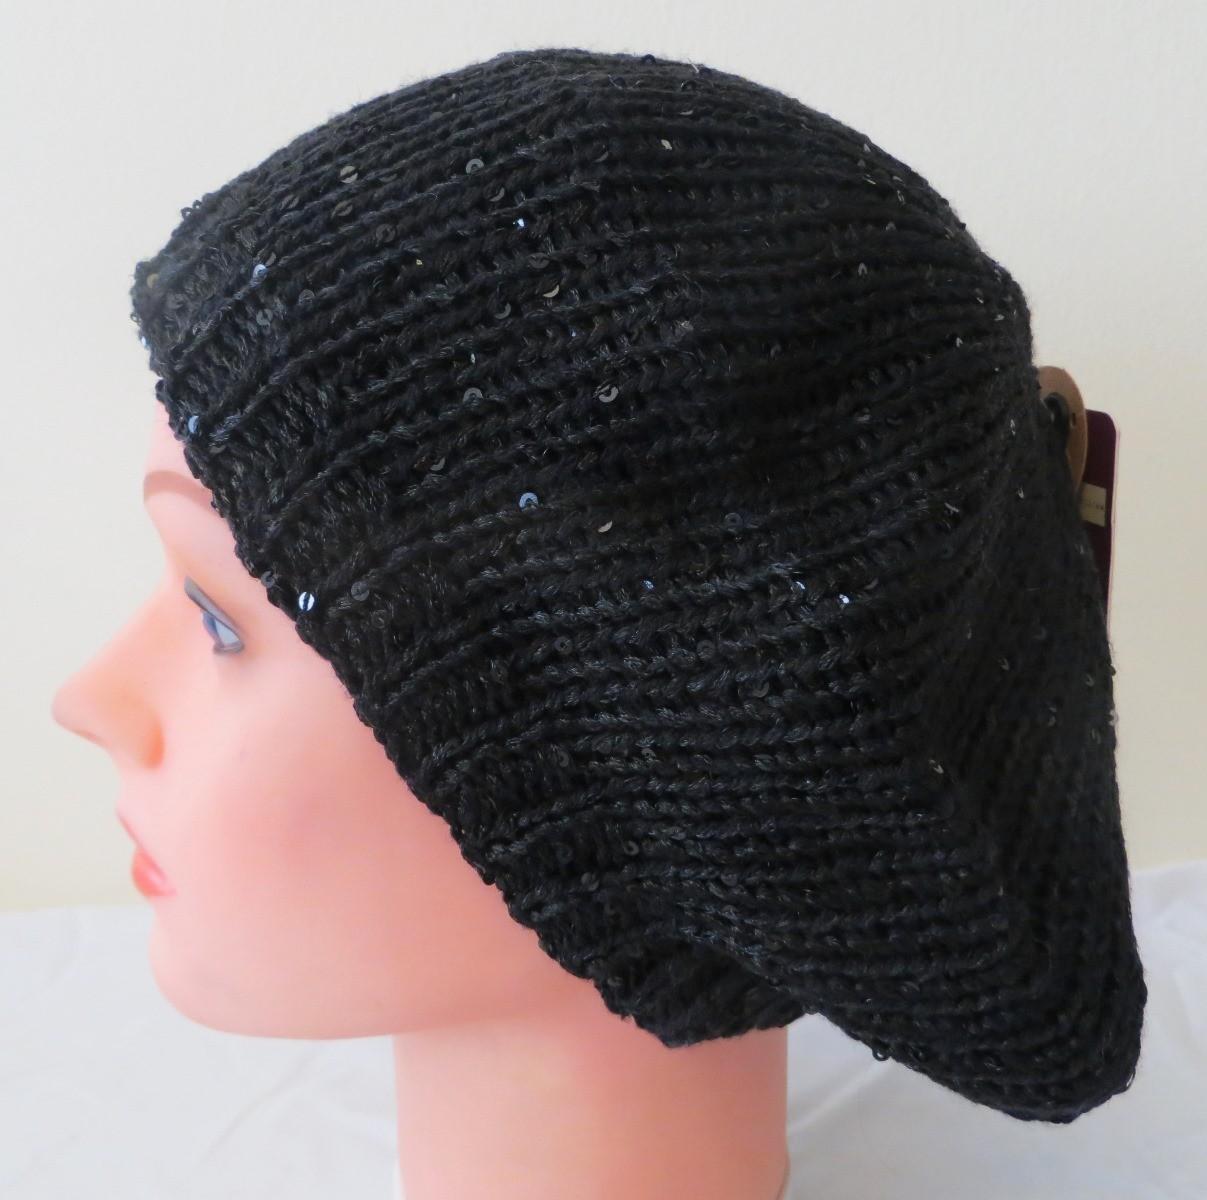 Black beret with light sparkles